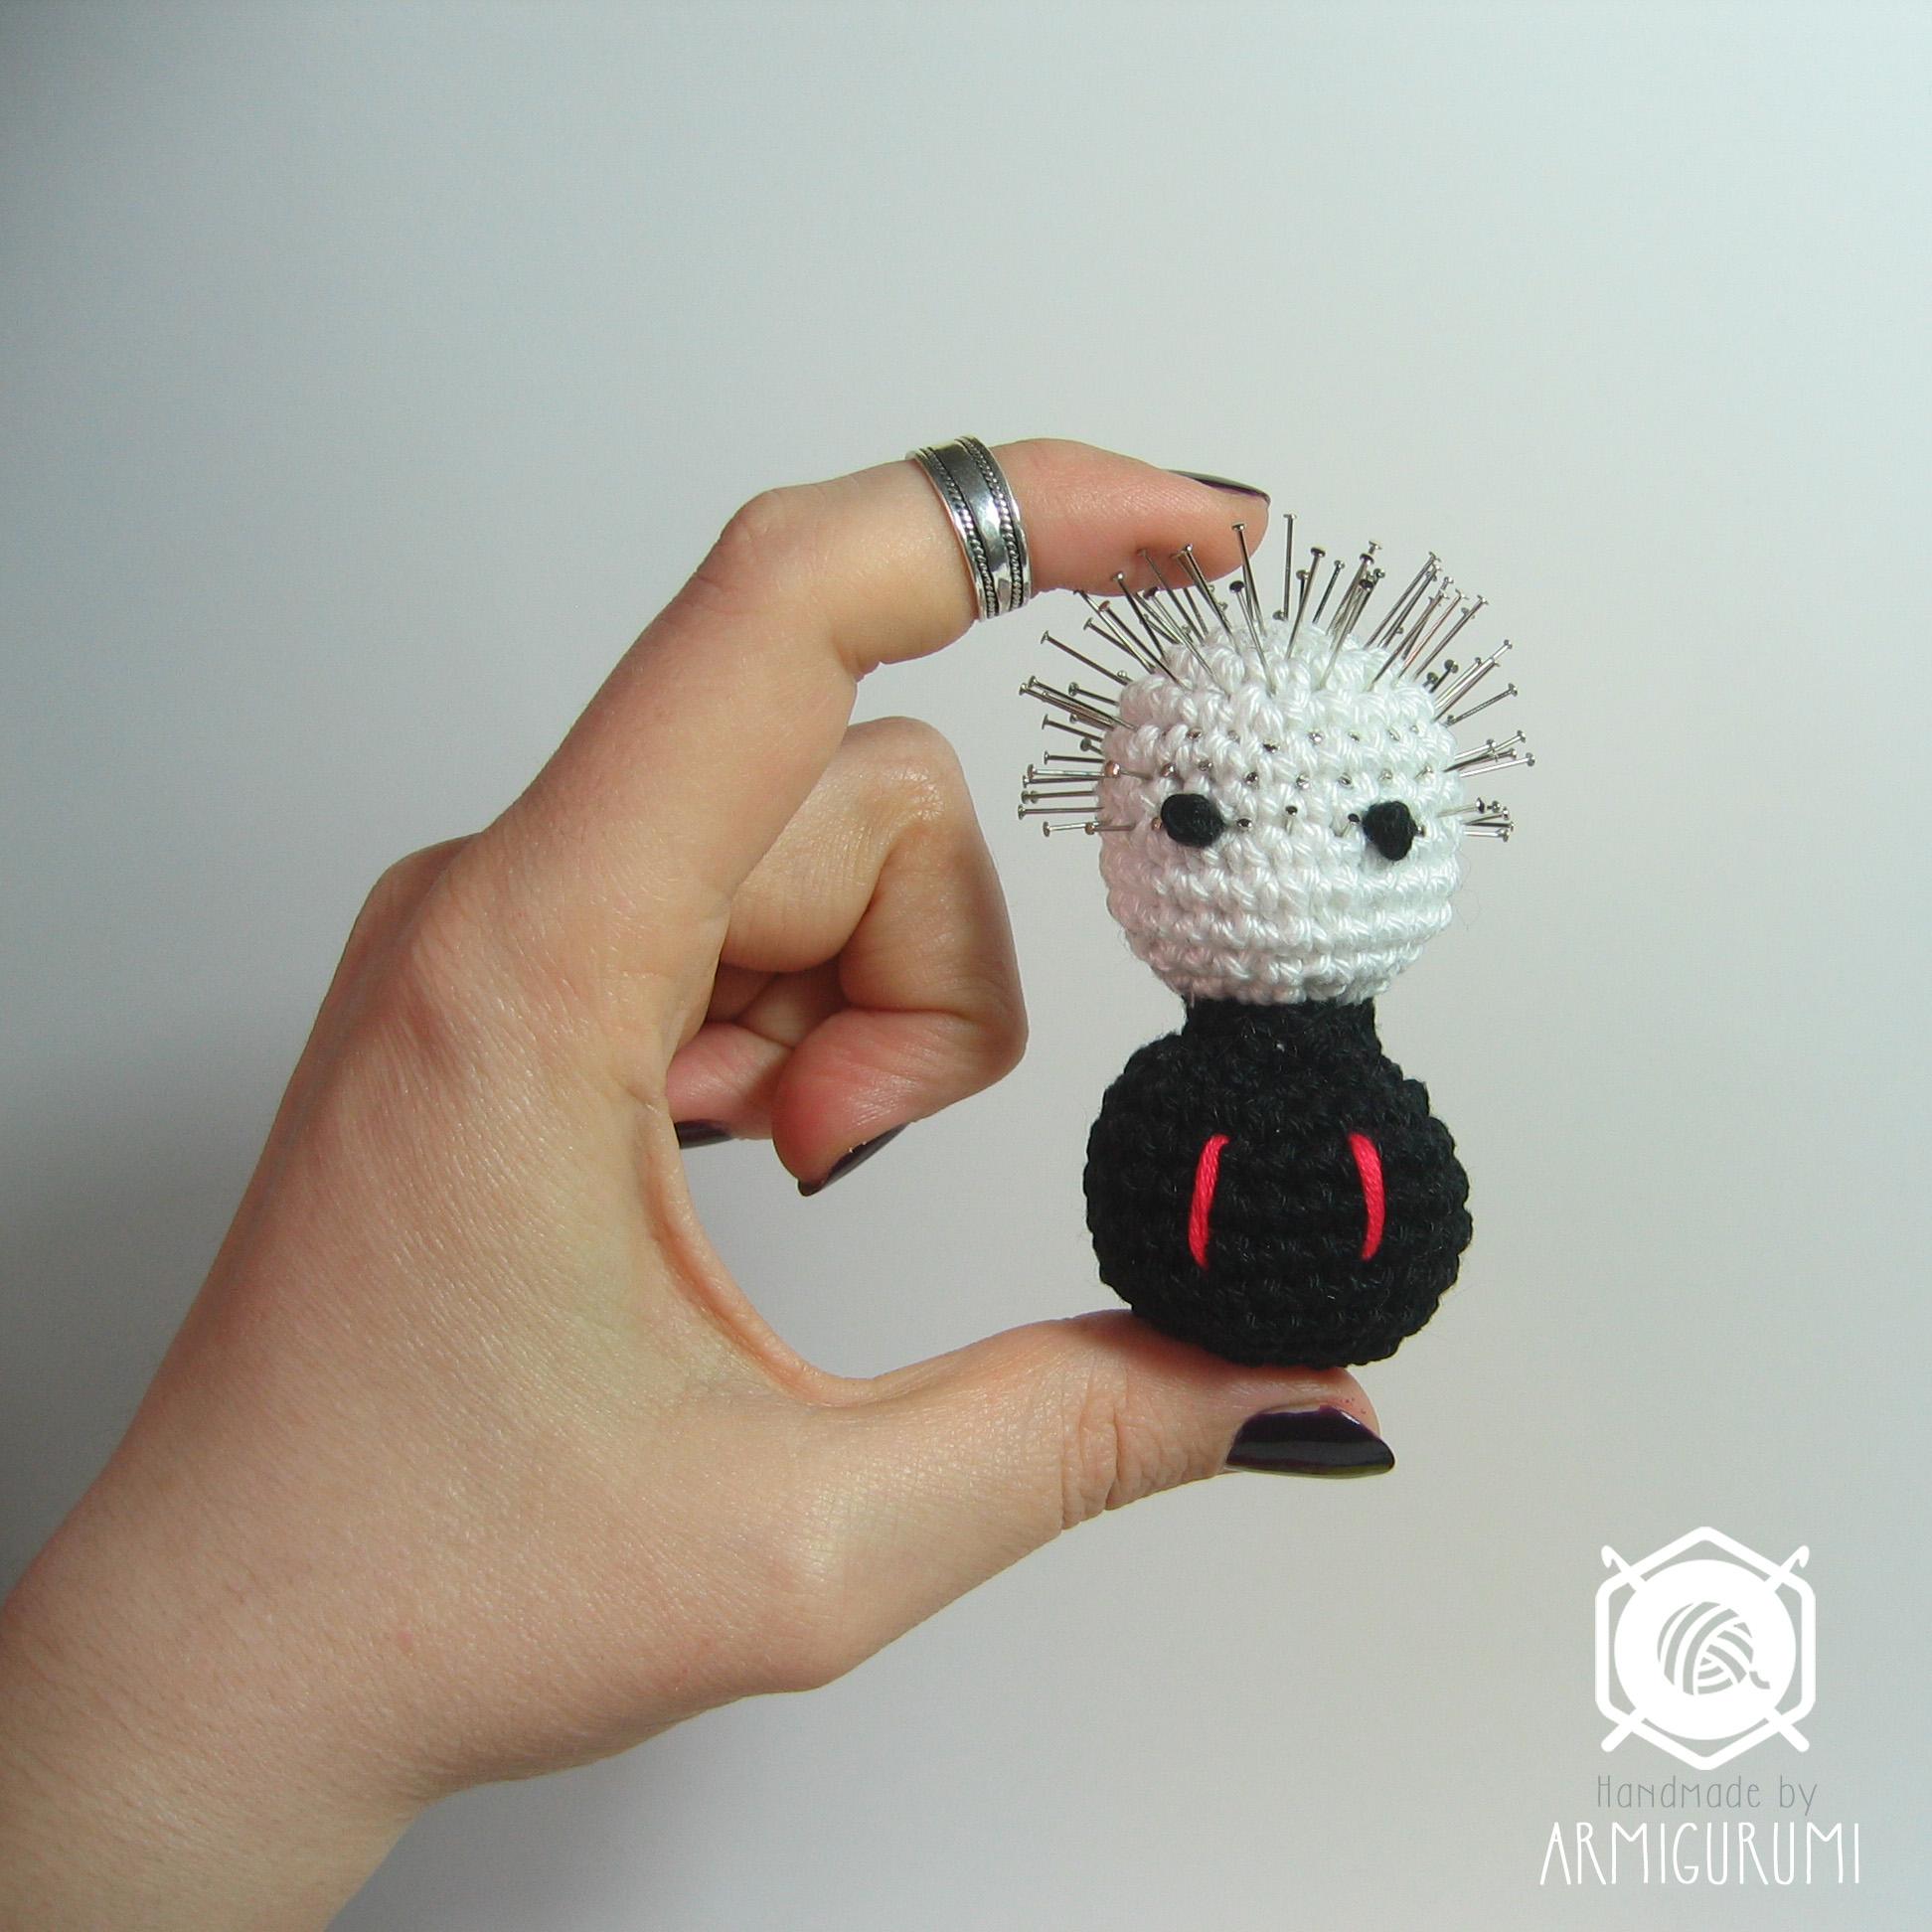 Pinhead pincushion from Hellraiser horror movie - amigurumi crochet pattern by Armigurumi